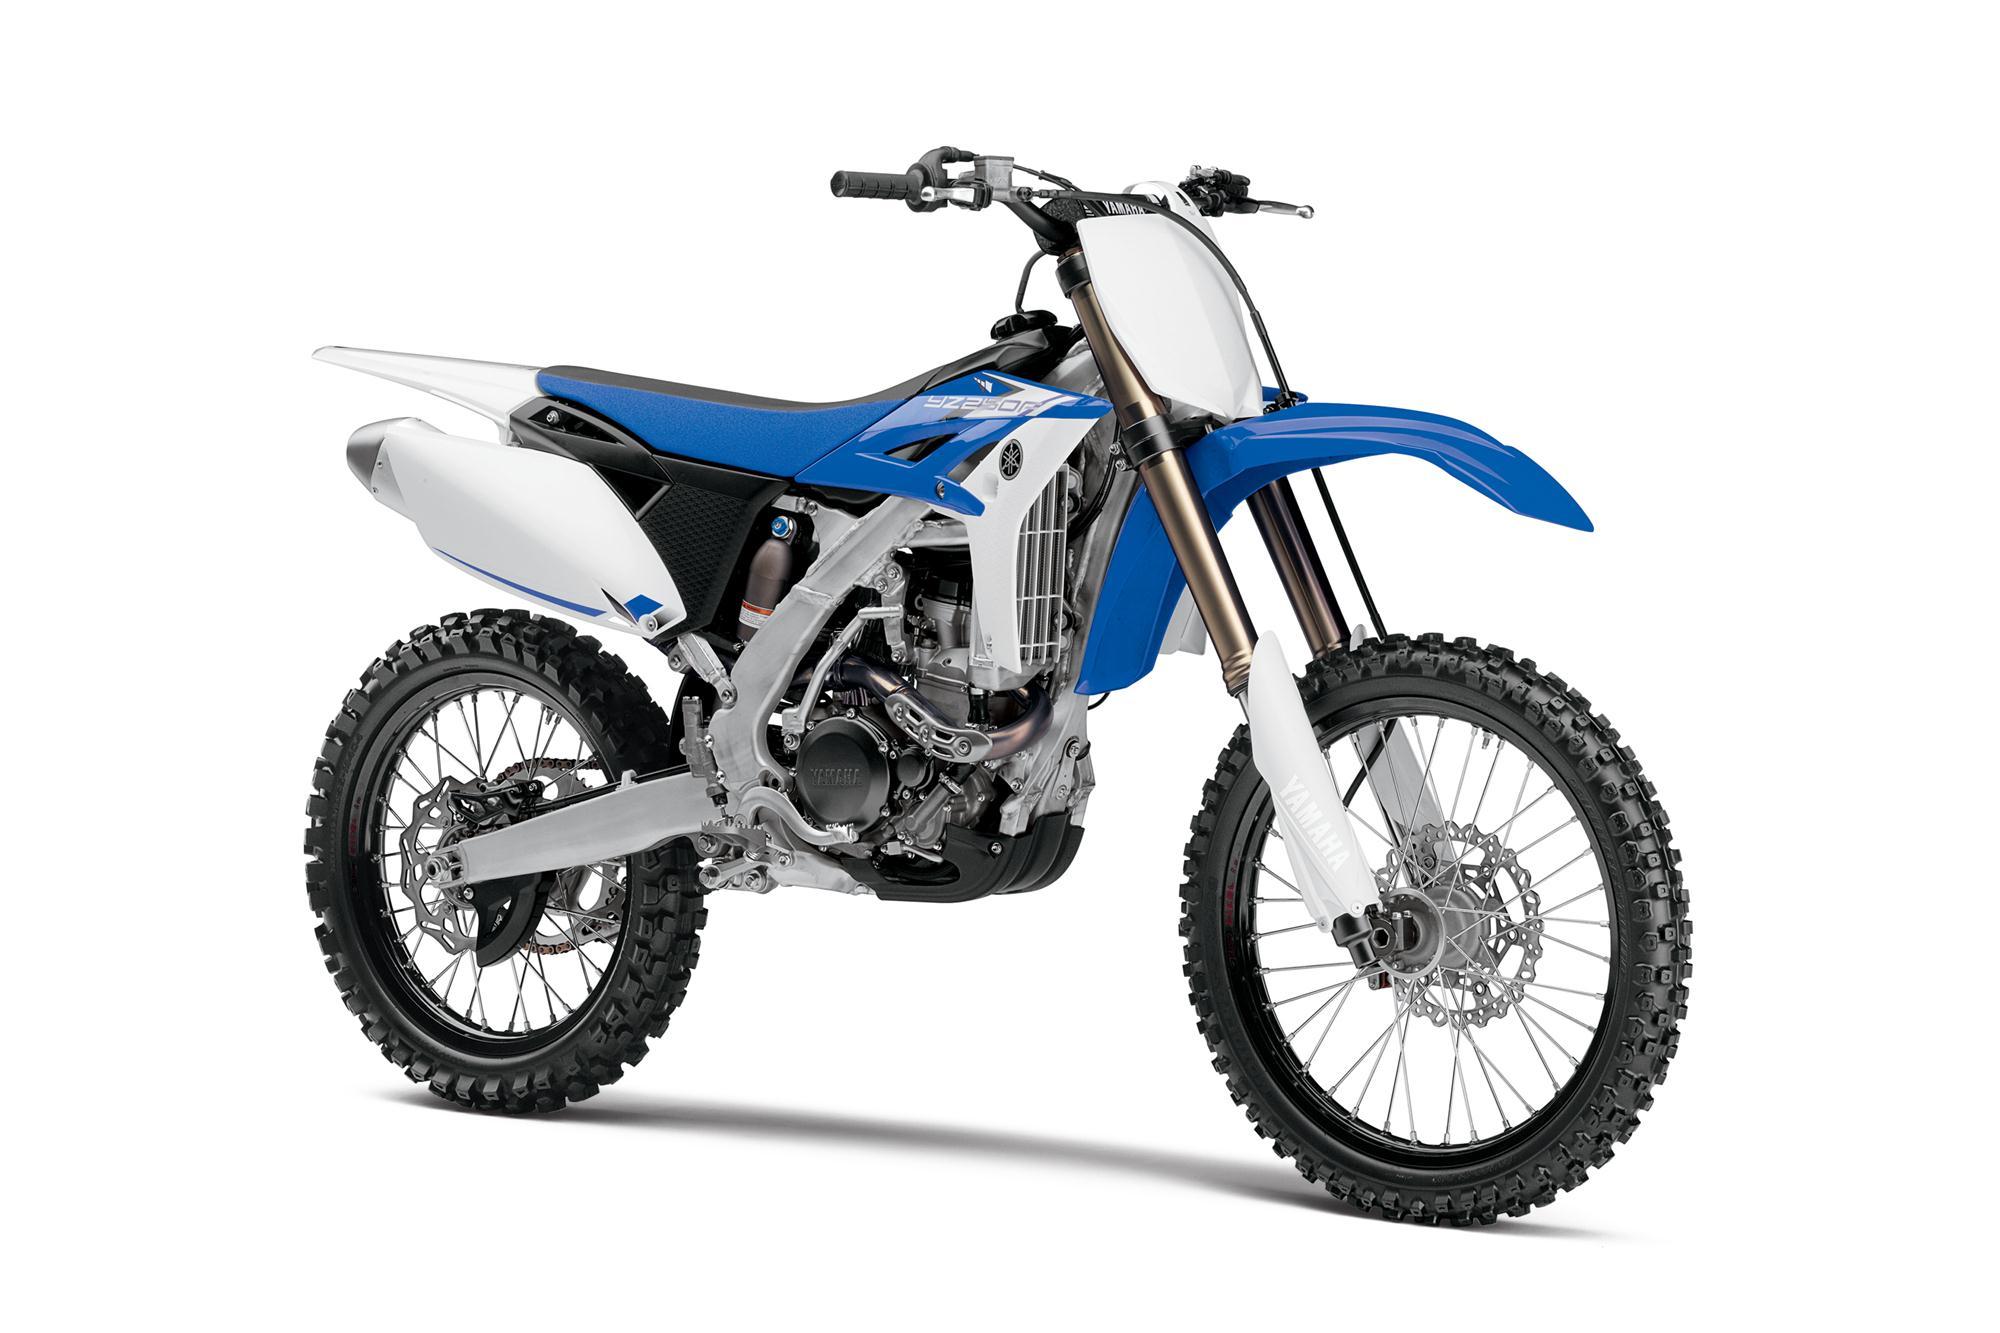 2013 Yamaha Yz250f The Lightweight Dirt Racing Machine Photo Gallery 51207 on 2017 Honda Concept Motorcycles